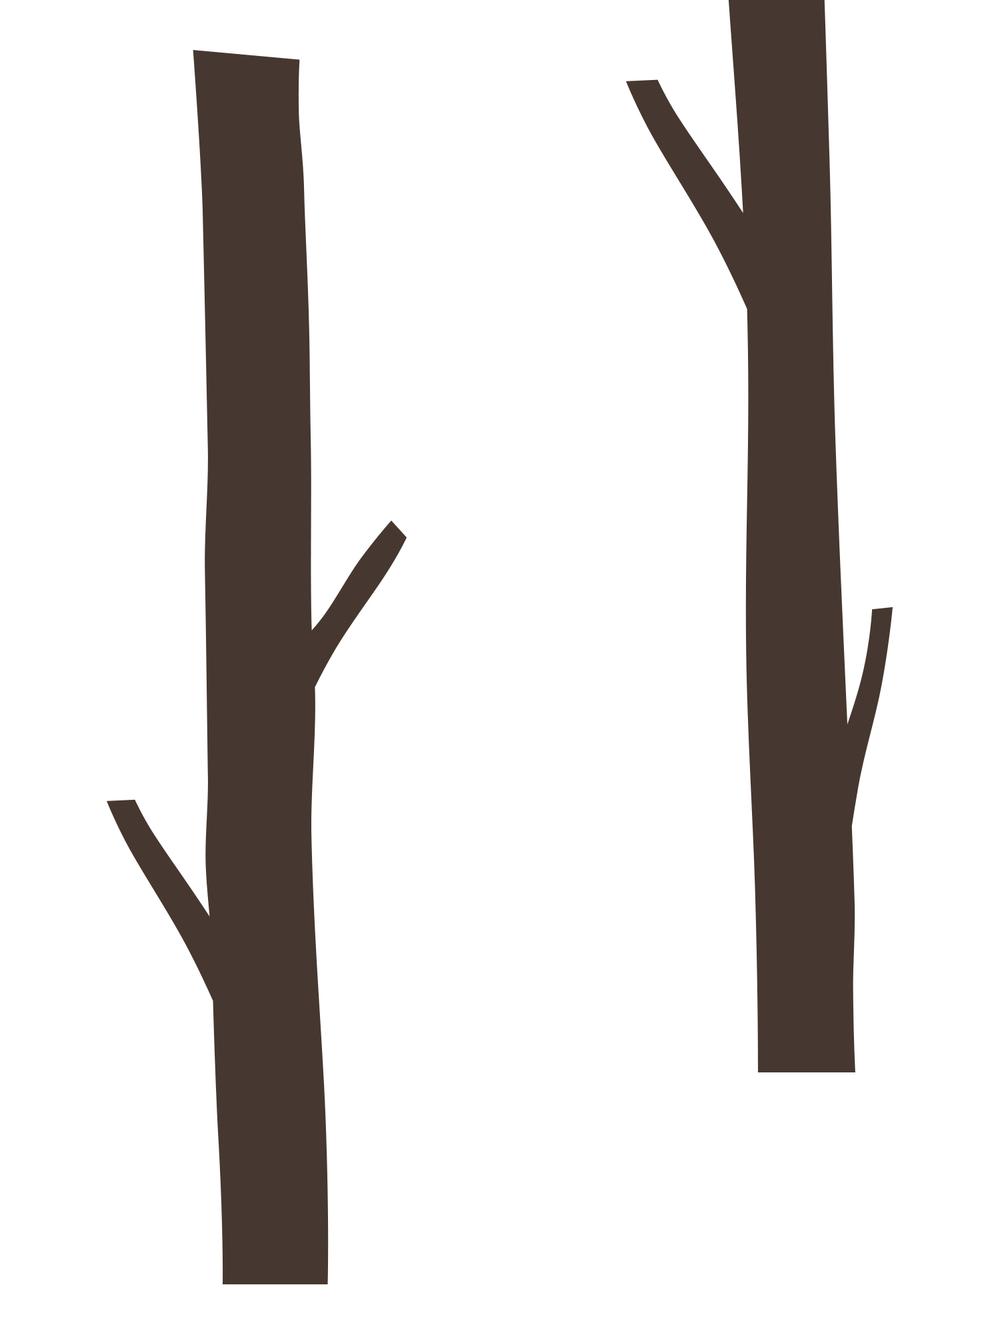 obscuredchristmas trees.jpg